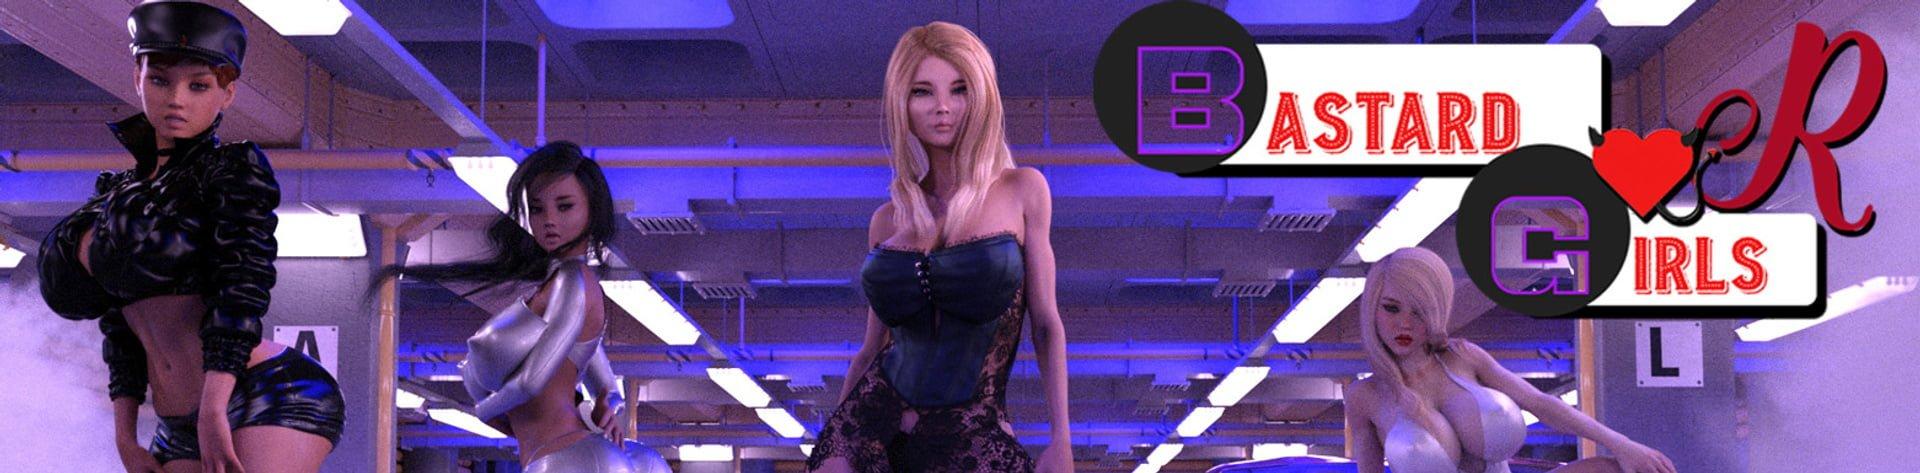 Bastard Girls R – Version 1.5B - Patreon family incest porn game 1